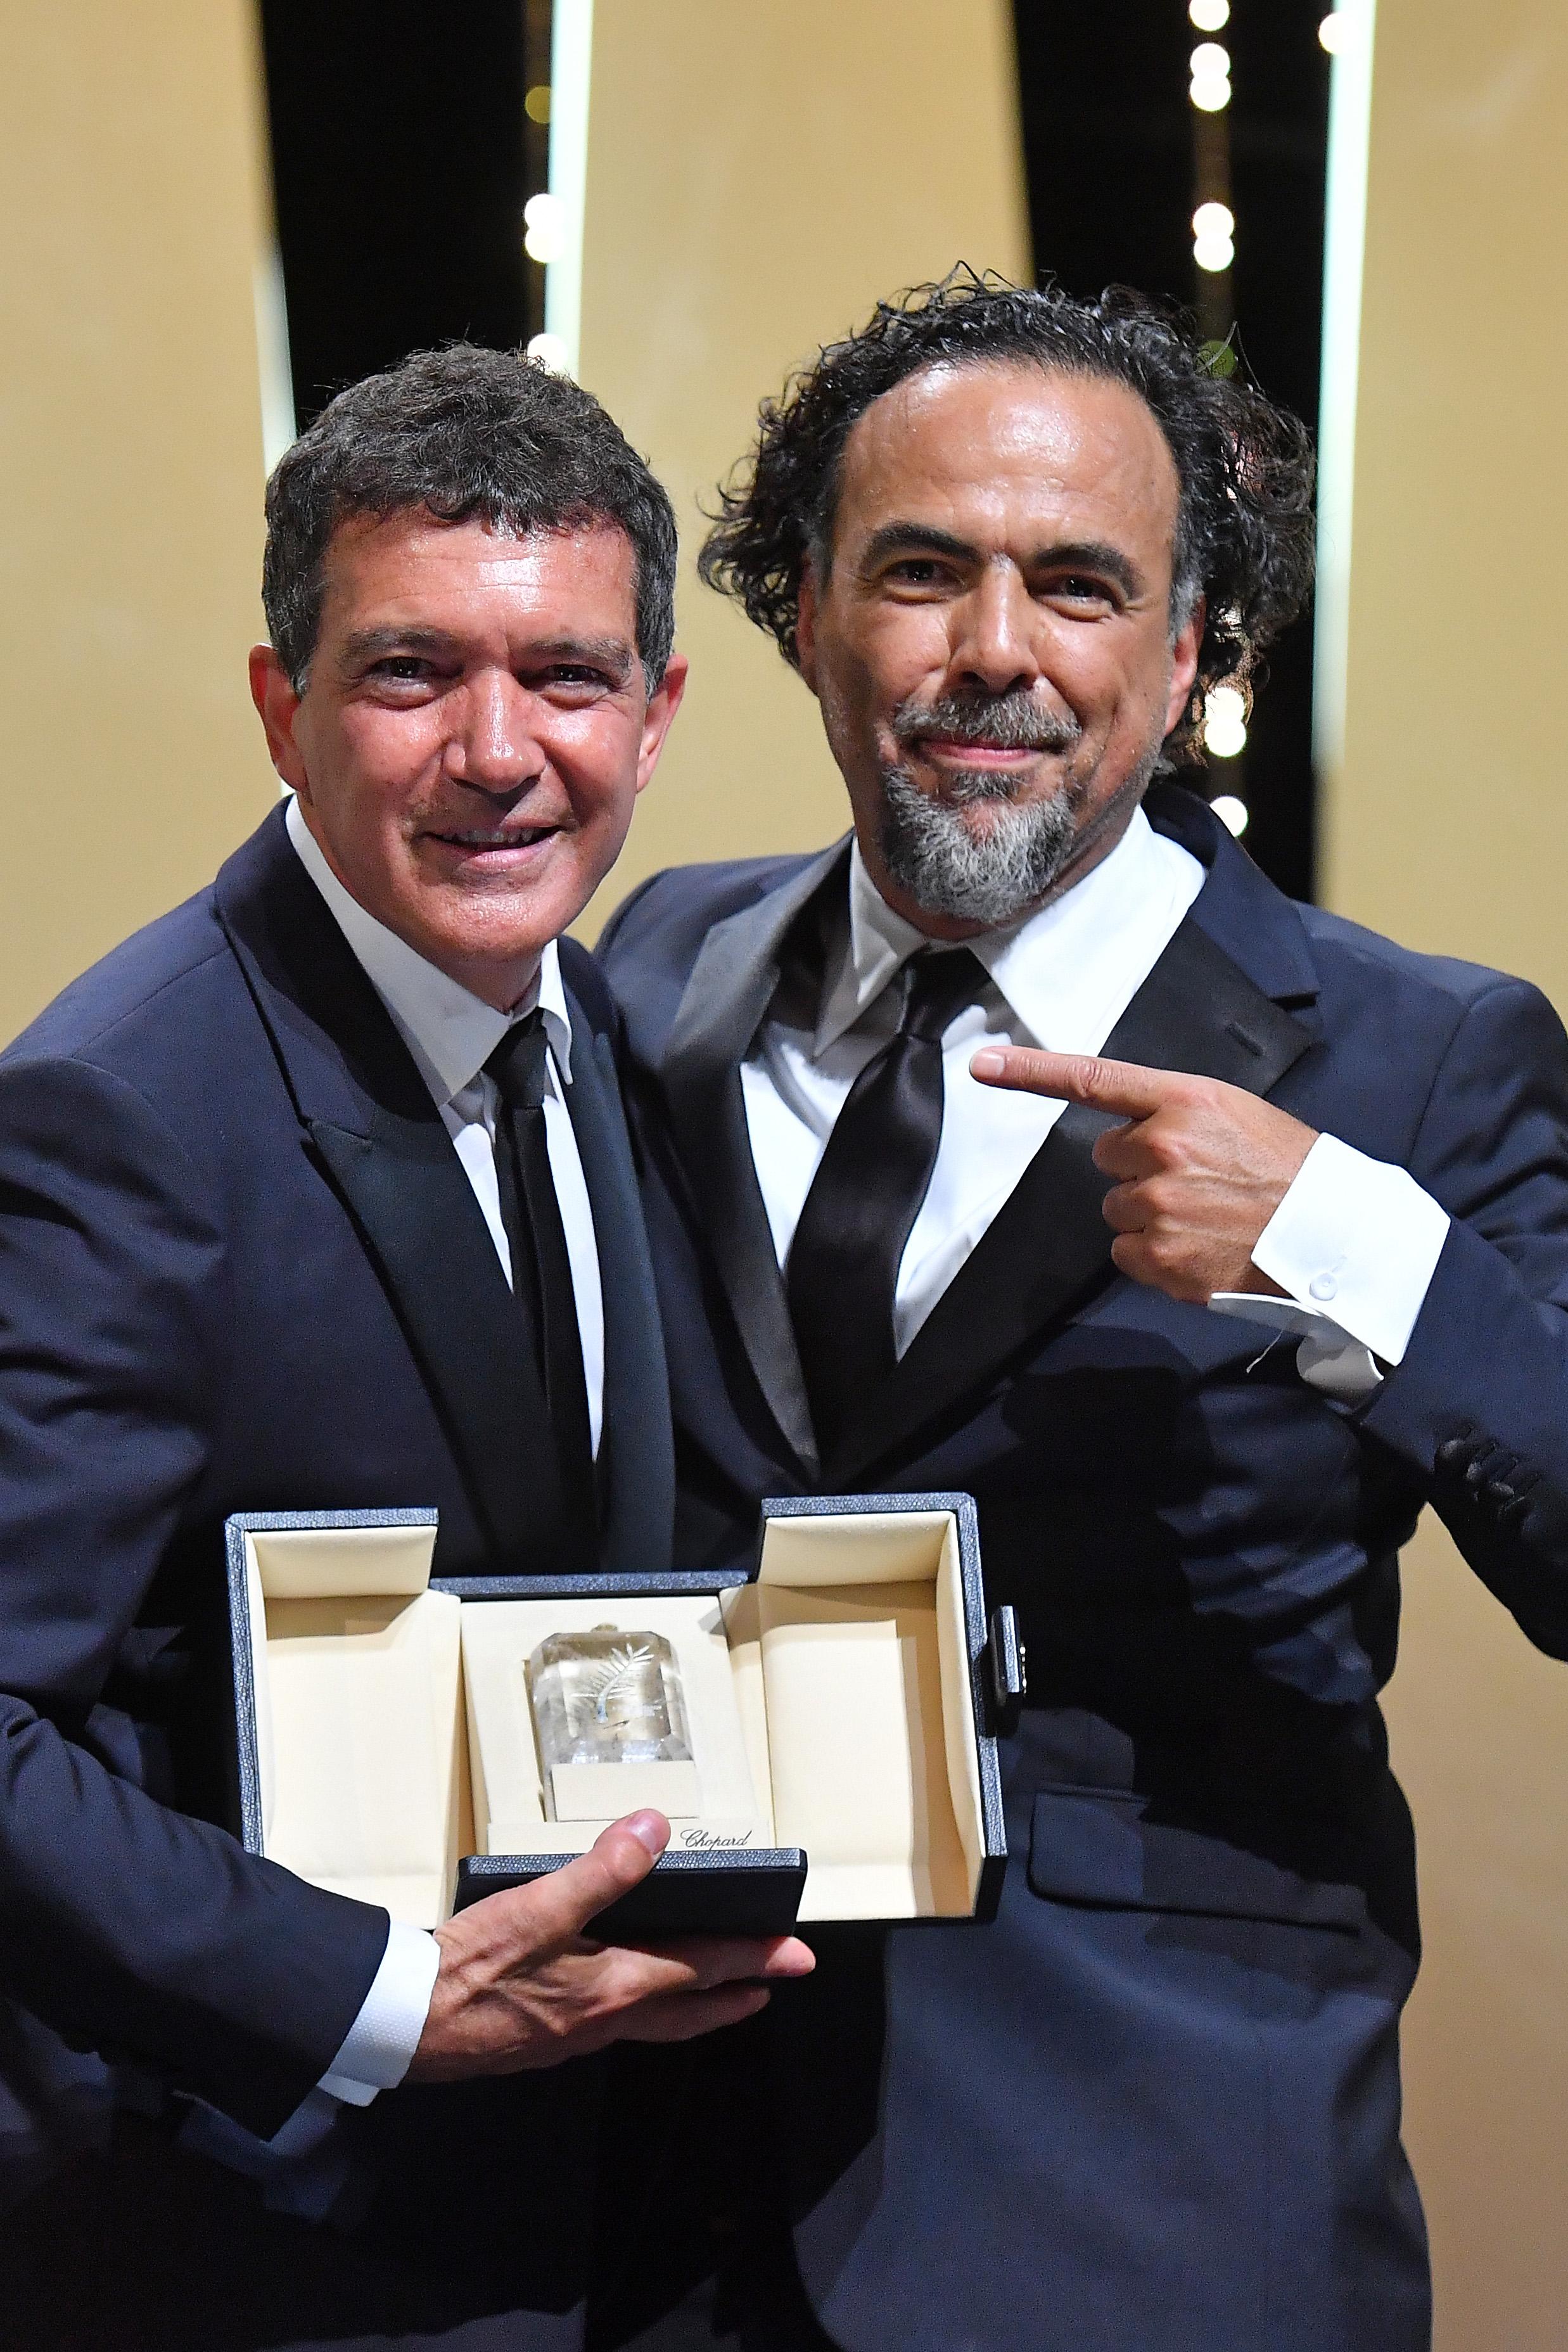 Antonio Banderas Alejandro González Iñárritu